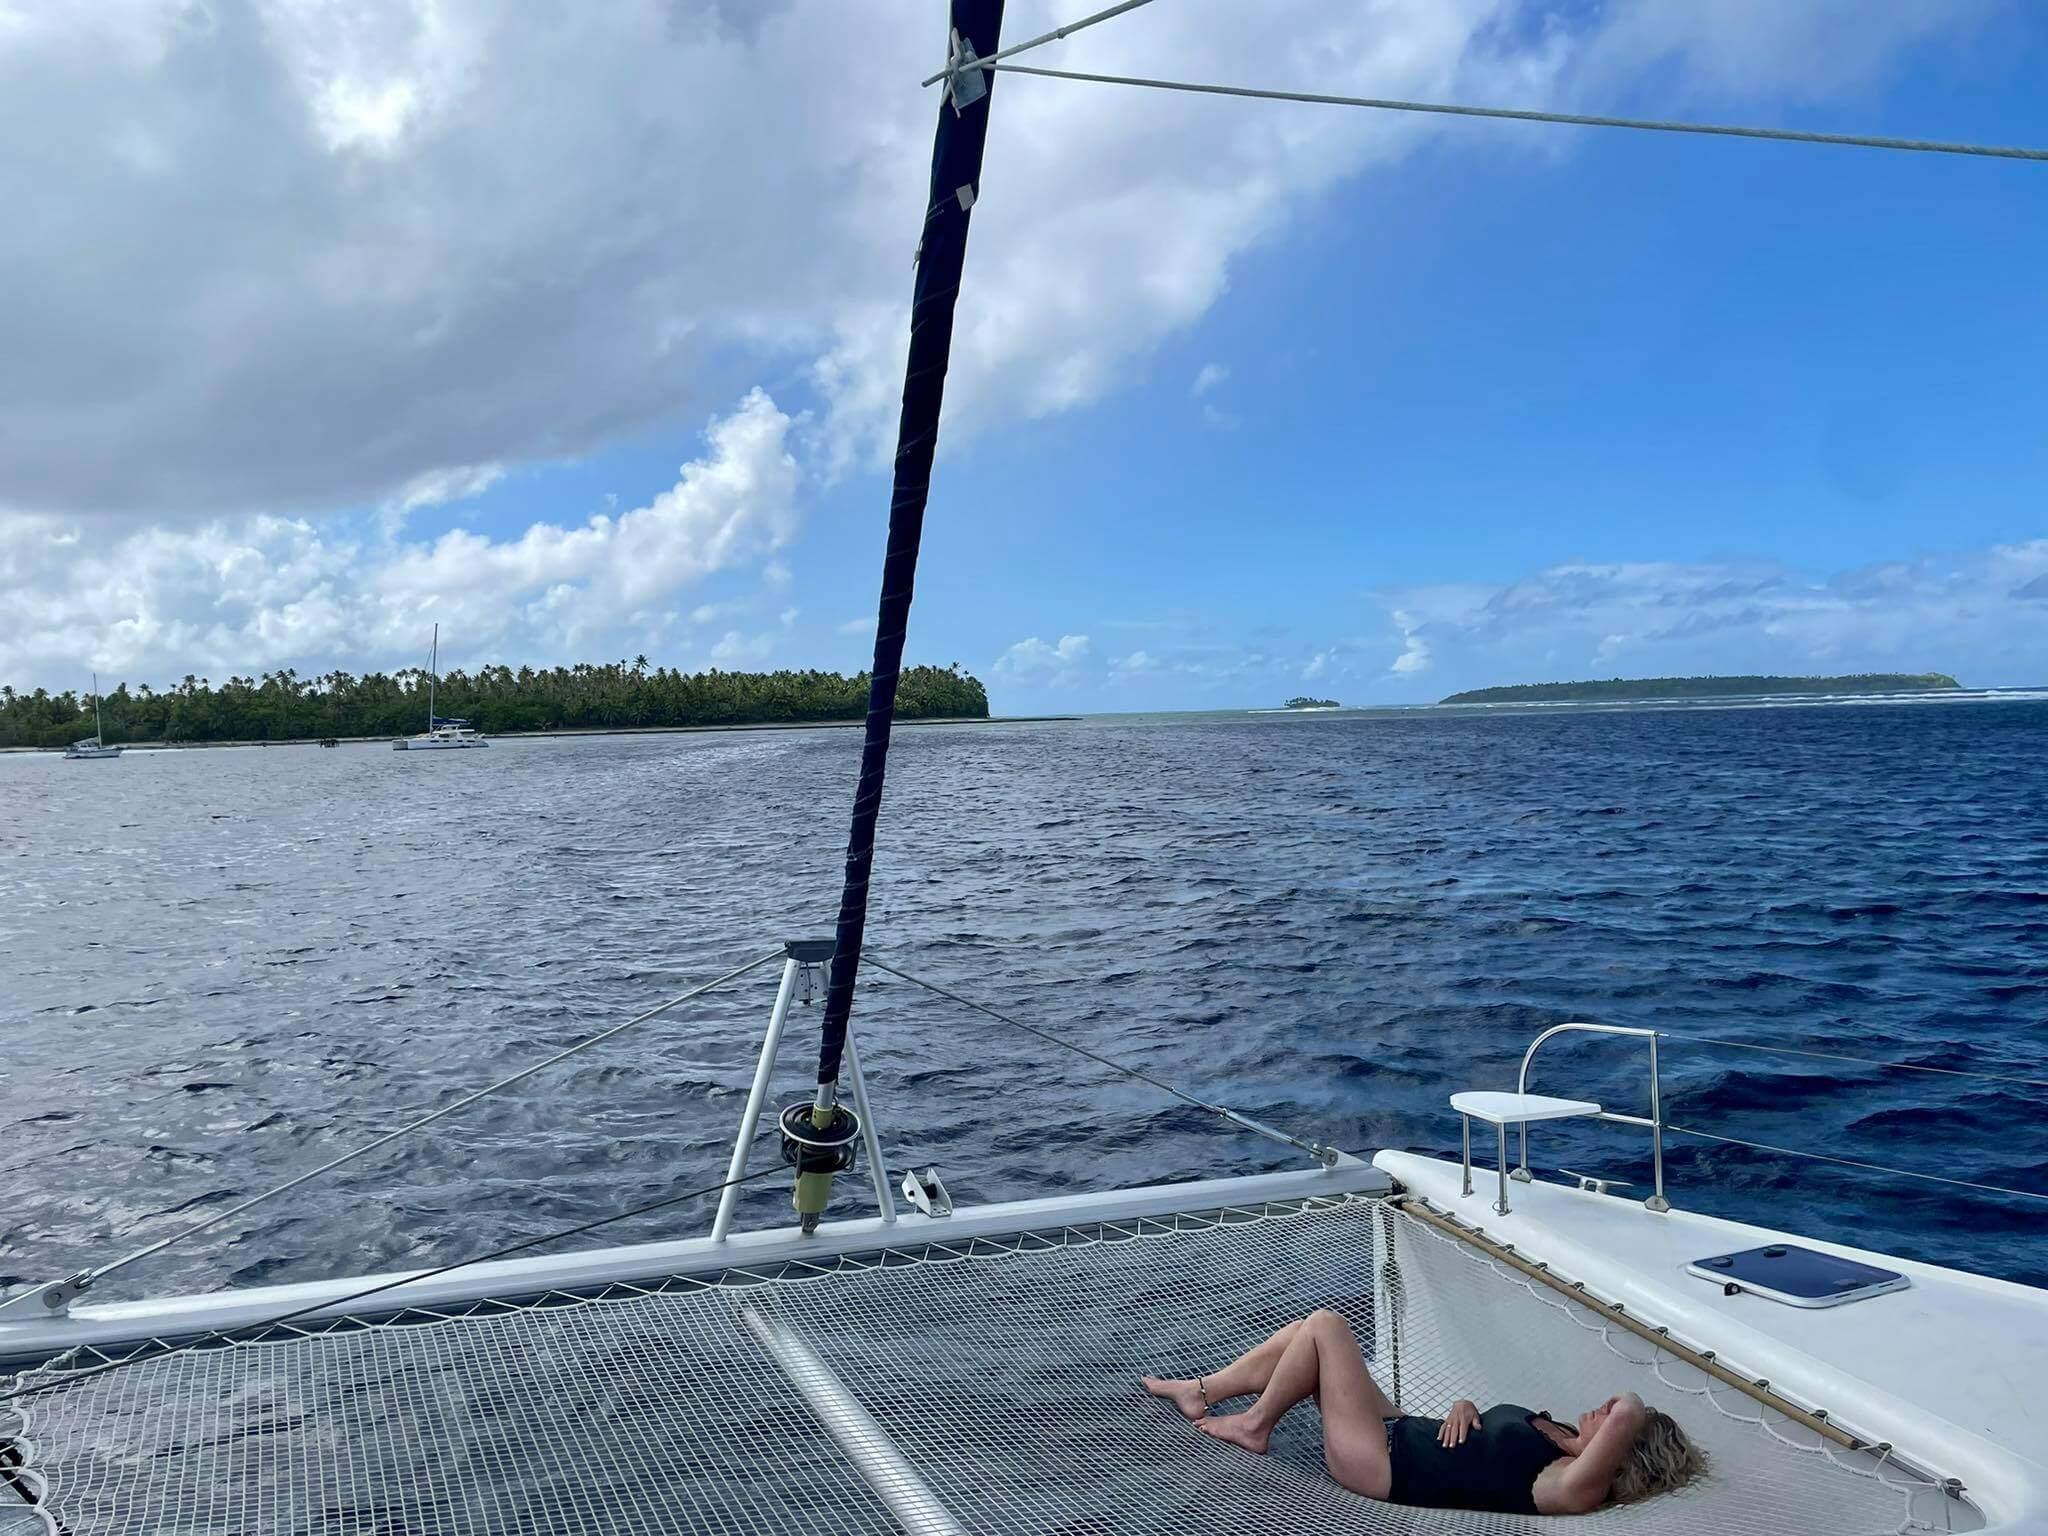 http://tahitivoileetlagon.com/wp-content/uploads/2021/07/chilling-TETIAROA.jpg